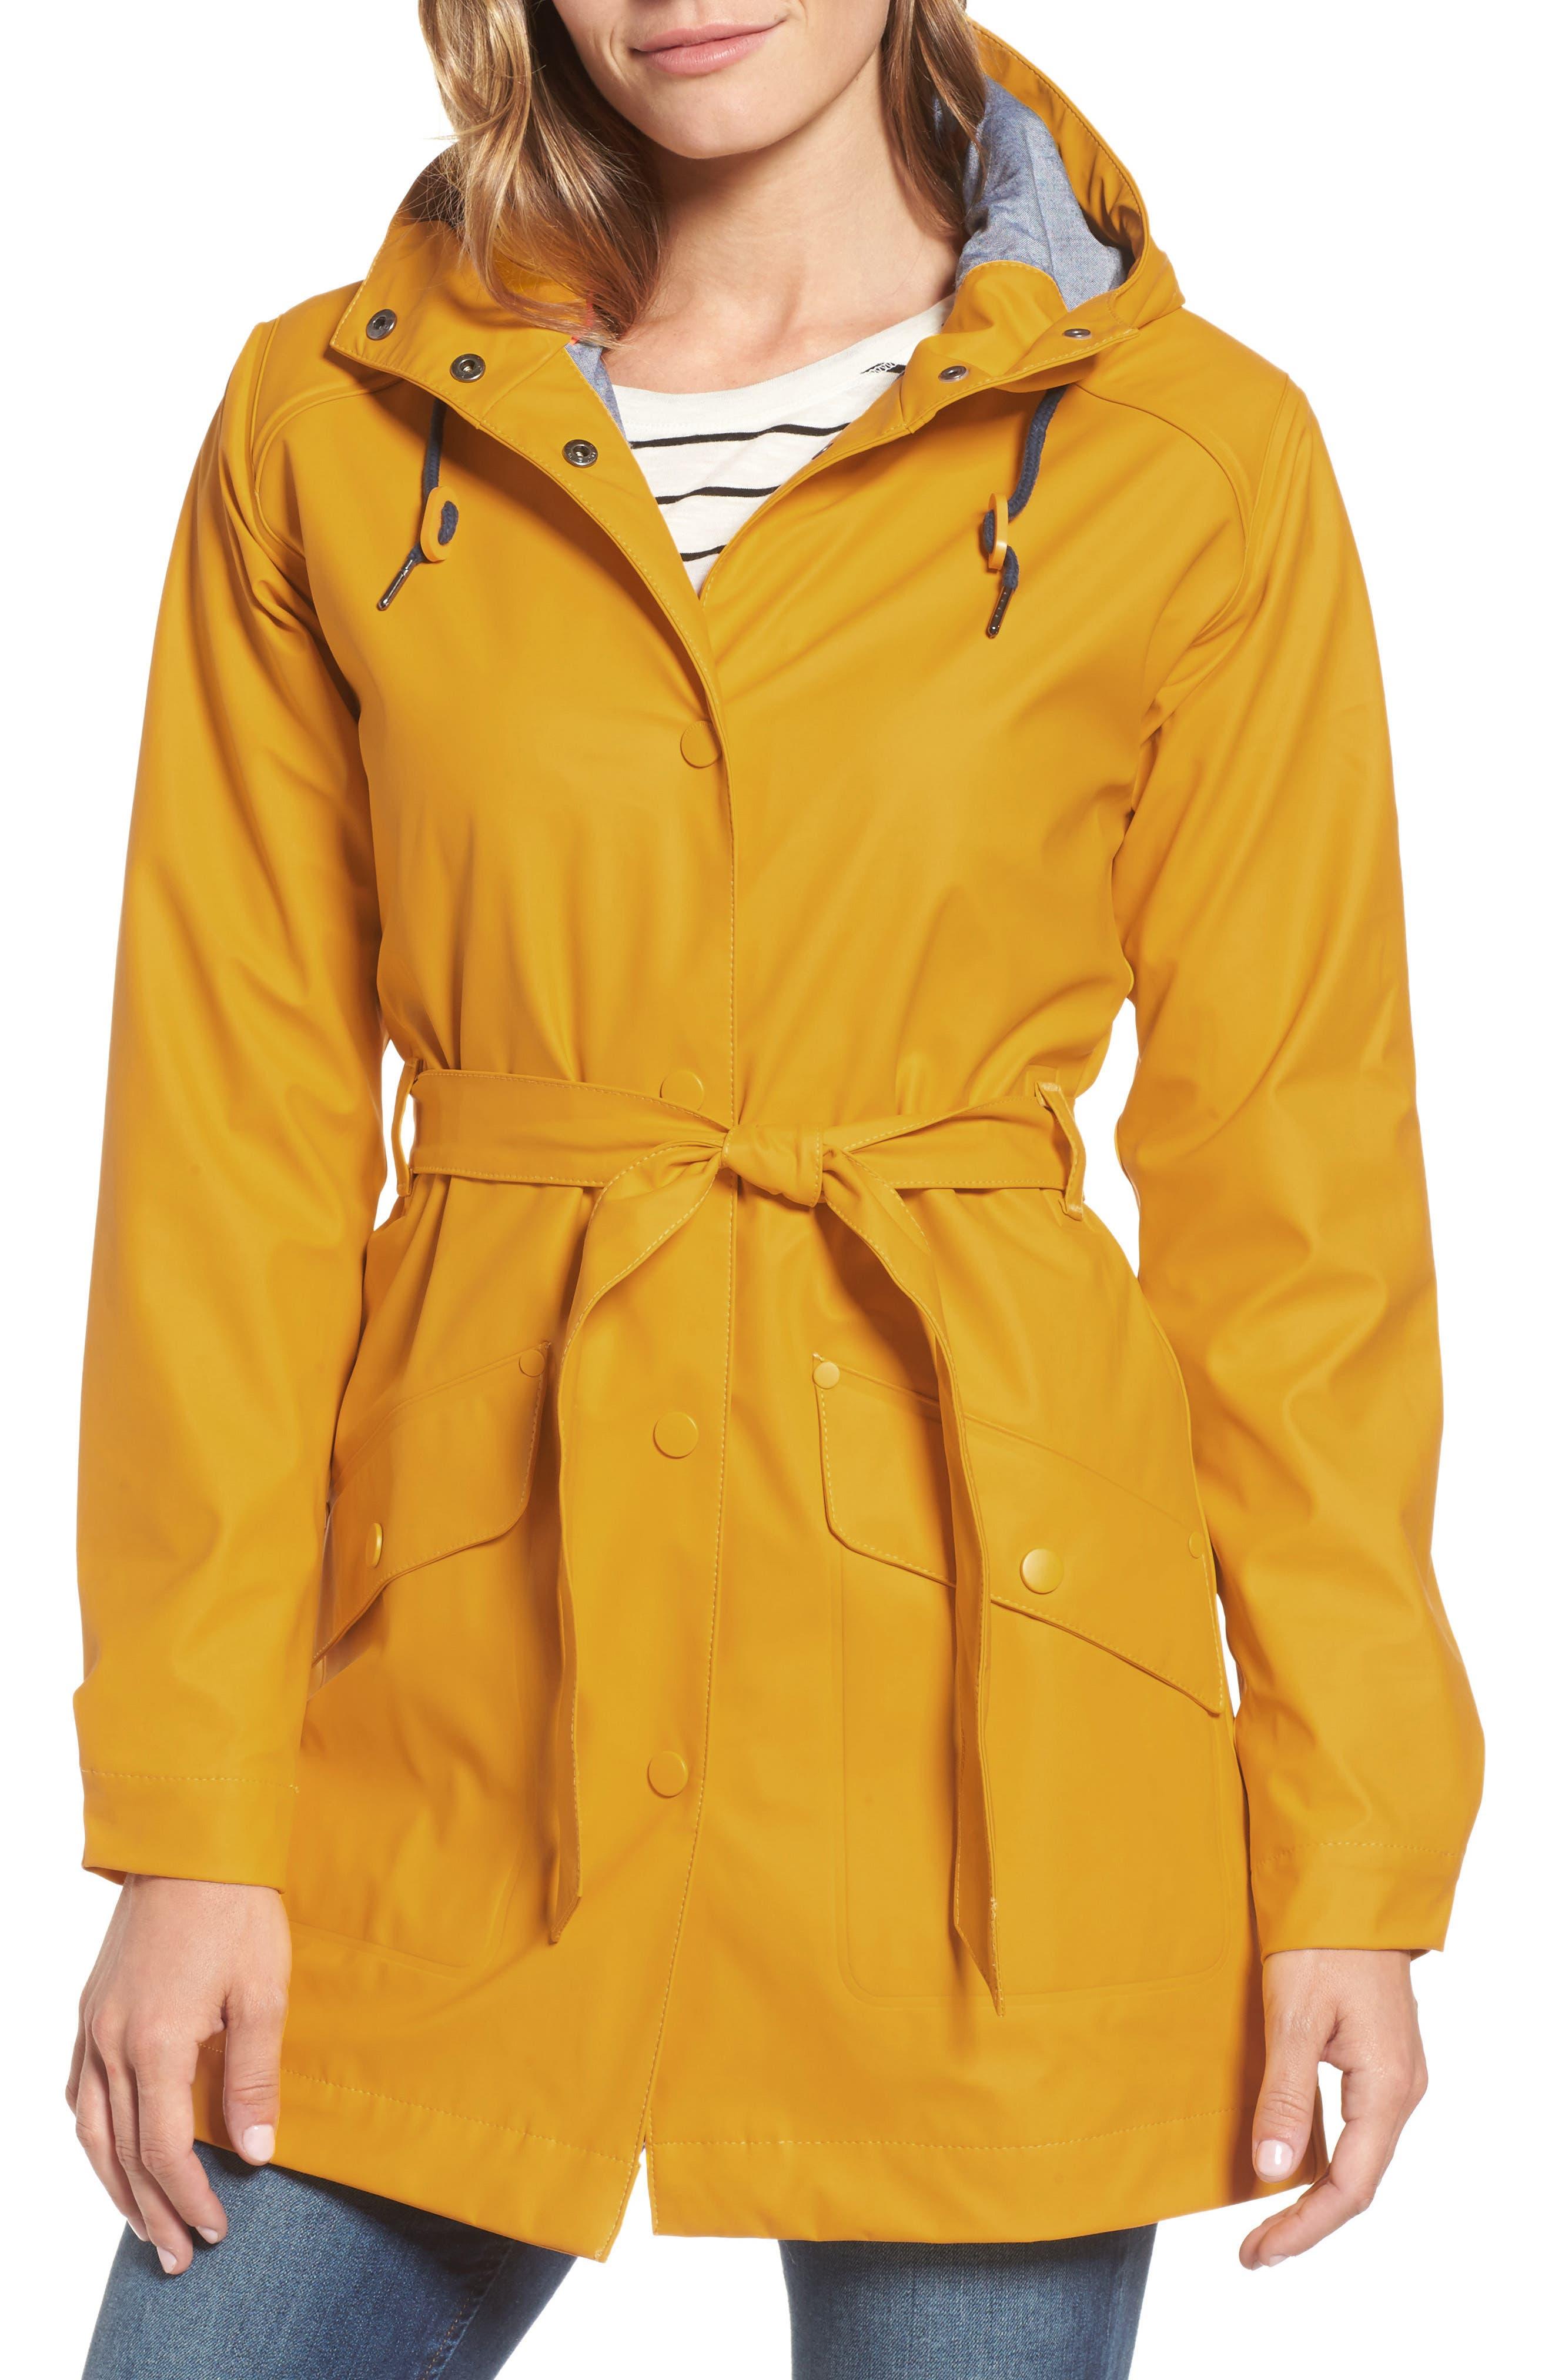 Kirkwall Raincoat,                             Main thumbnail 1, color,                             ESSENTIAL YELLOW